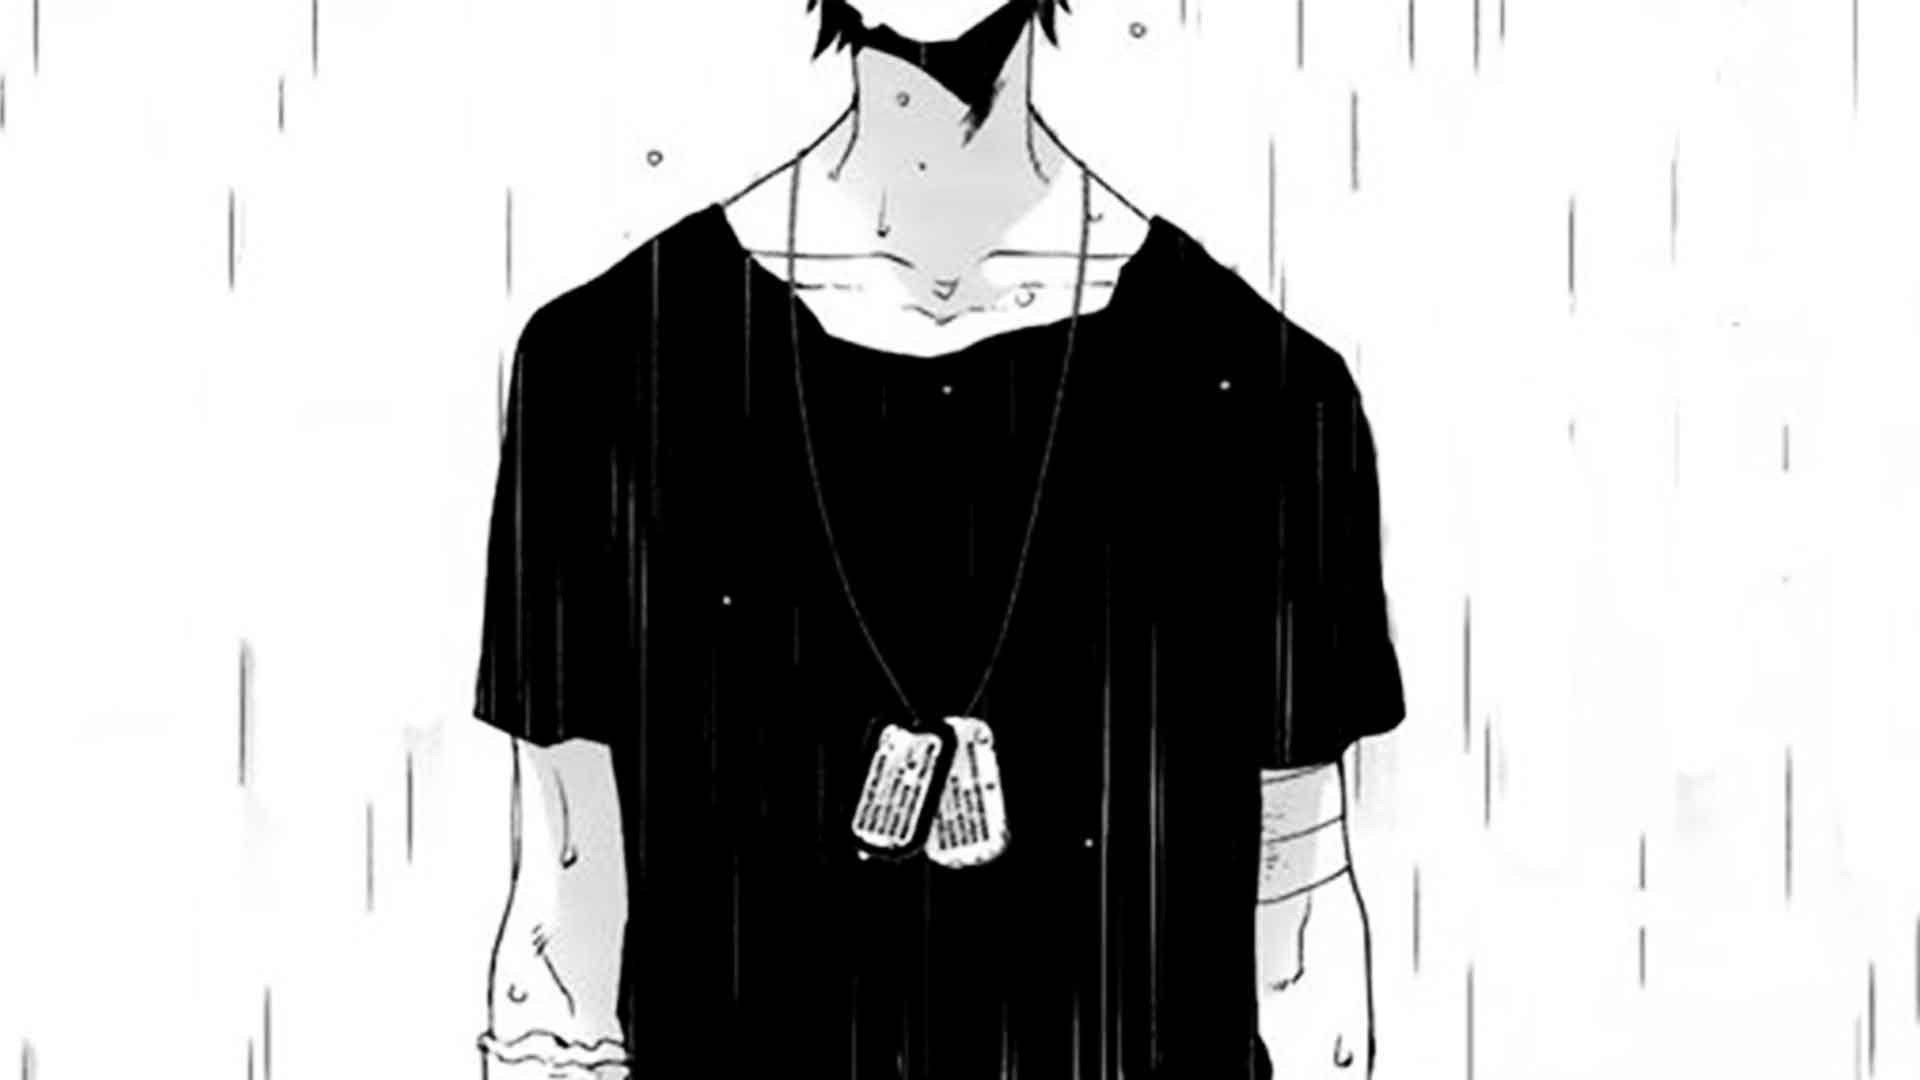 Sad Boy Anime Wallpapers Top Free Sad Boy Anime Backgrounds Wallpaperaccess